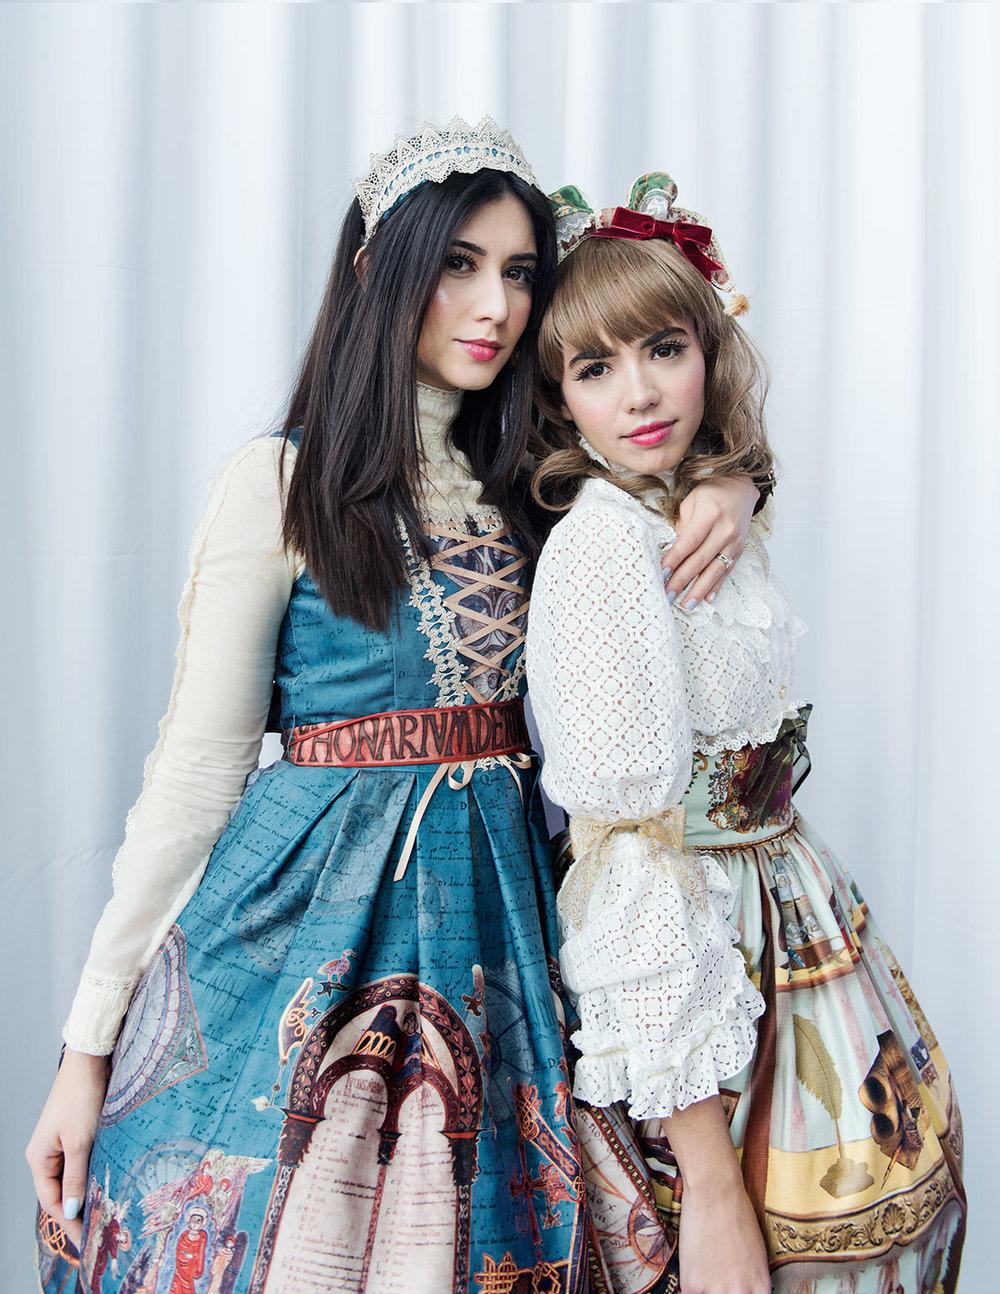 AMP_SewnSeeds_Lolita_07.jpg